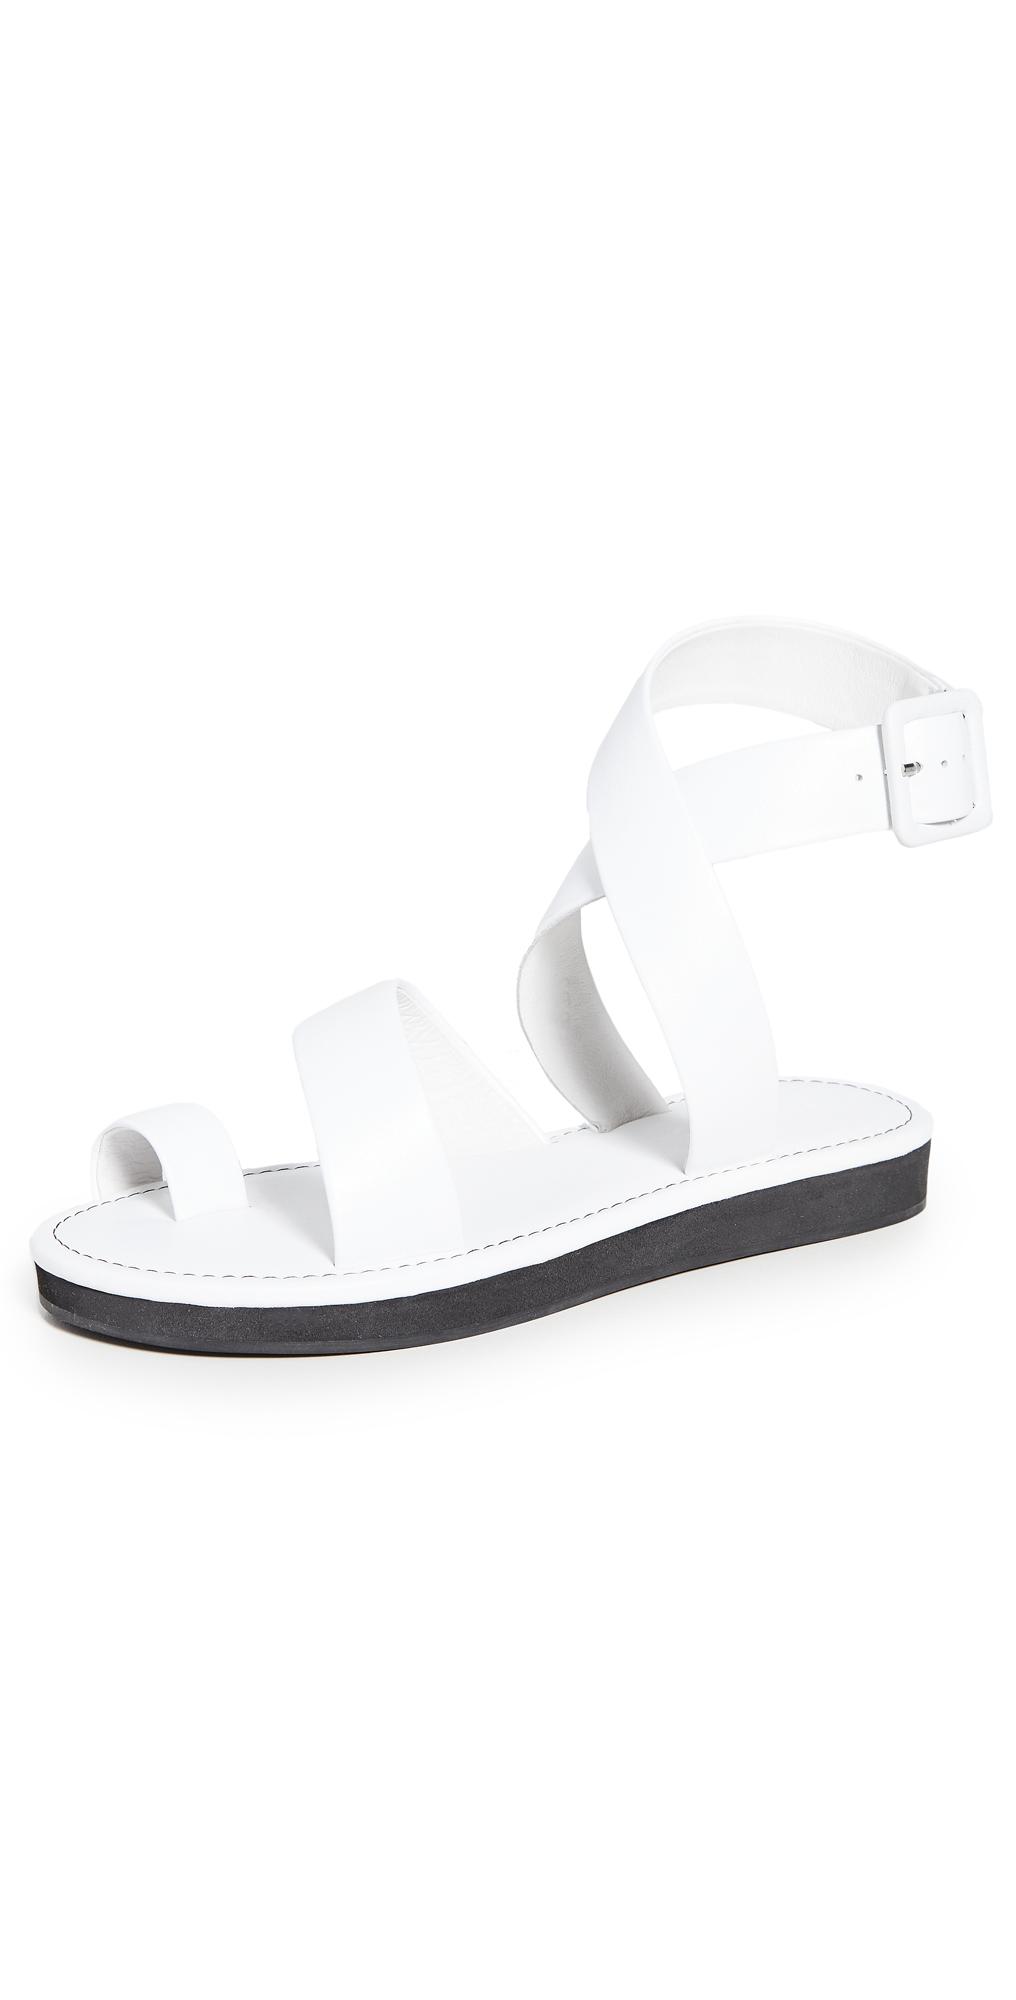 Honor Sandals